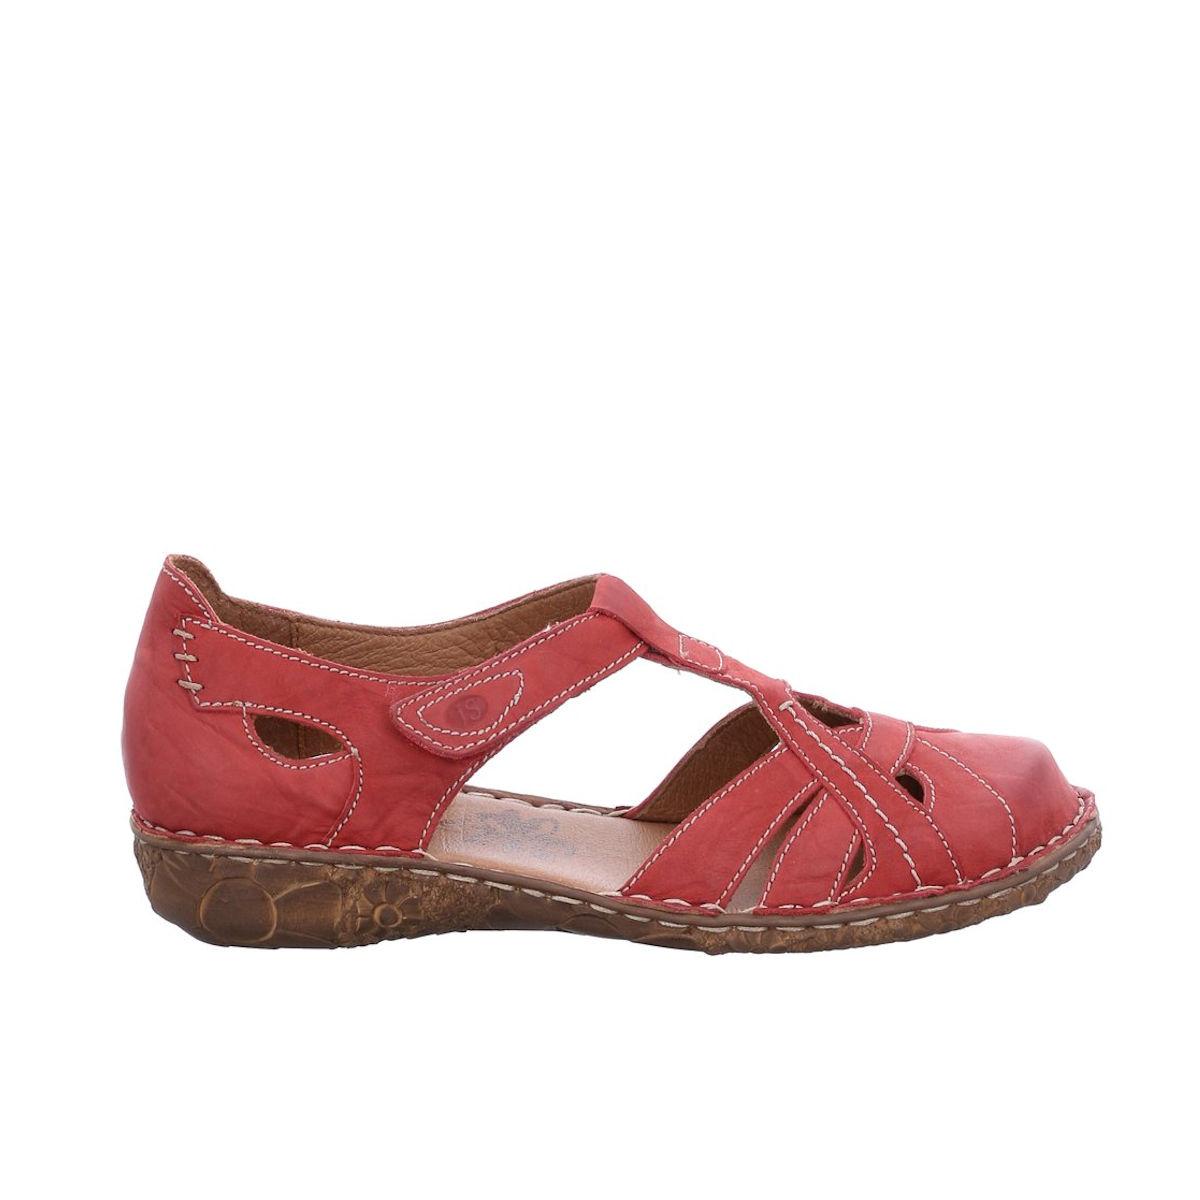 Josef Seibel Rosalie 29 - Womens Red Hibiscus Closed Toe Sandal